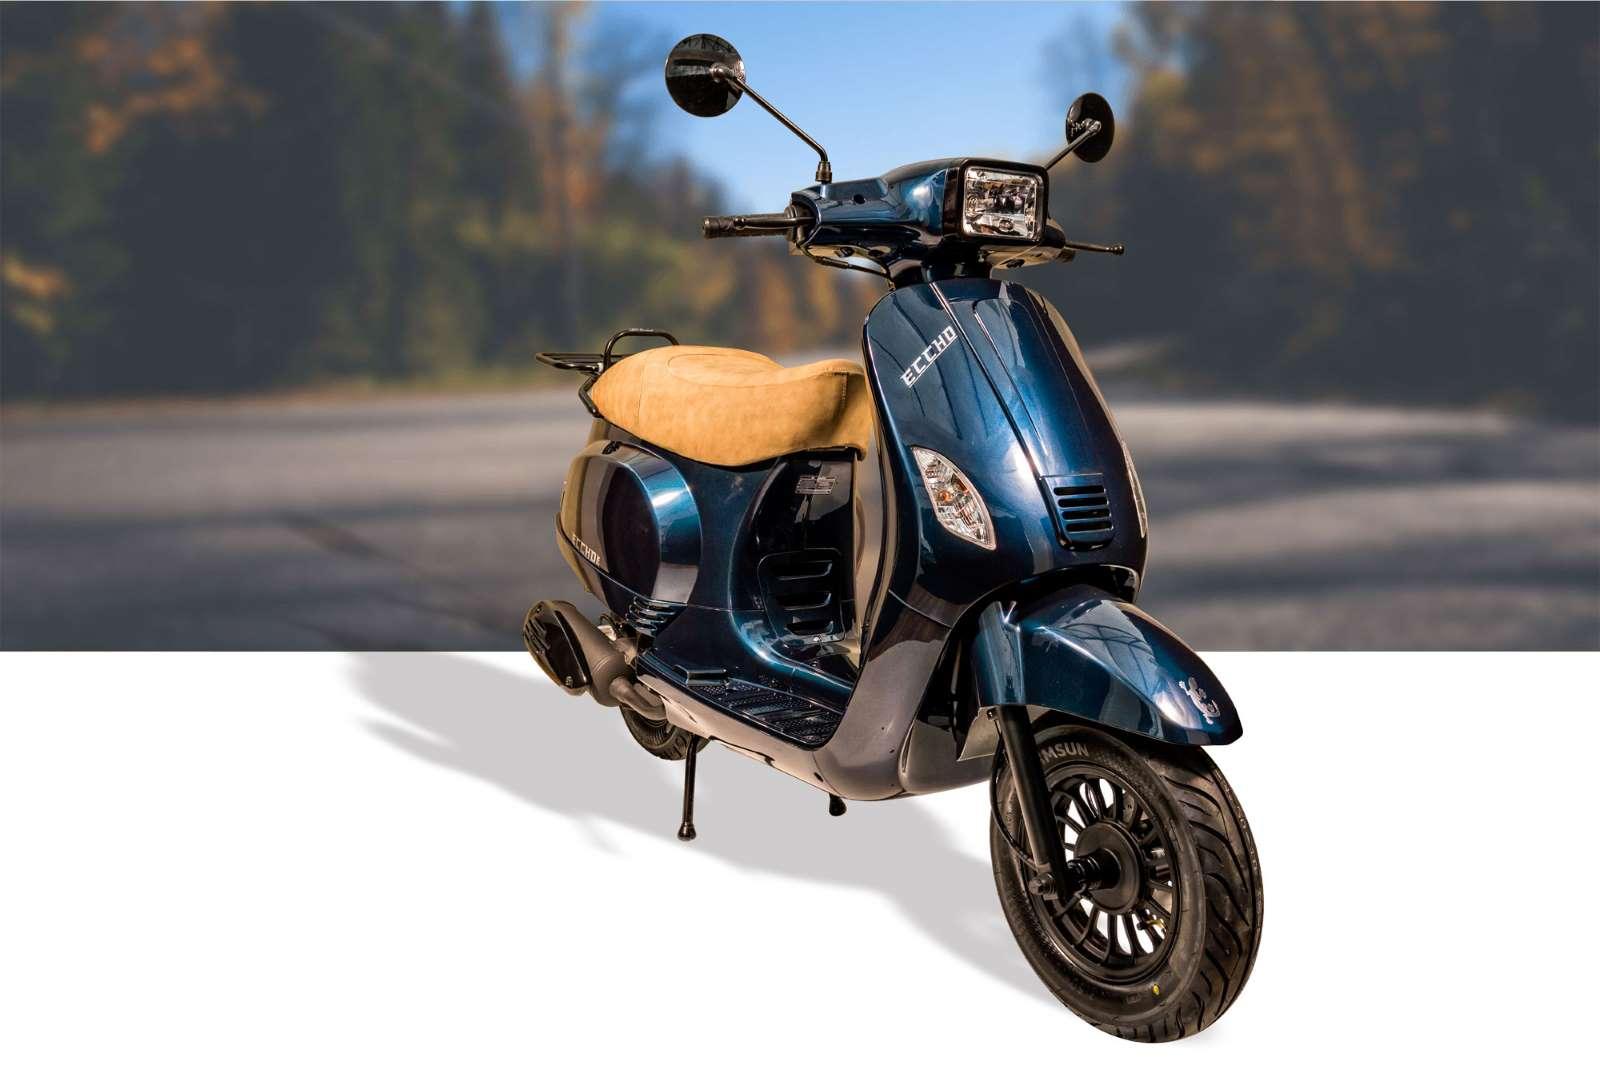 scooters eccho cholet acheter un scooter a cholet. Black Bedroom Furniture Sets. Home Design Ideas